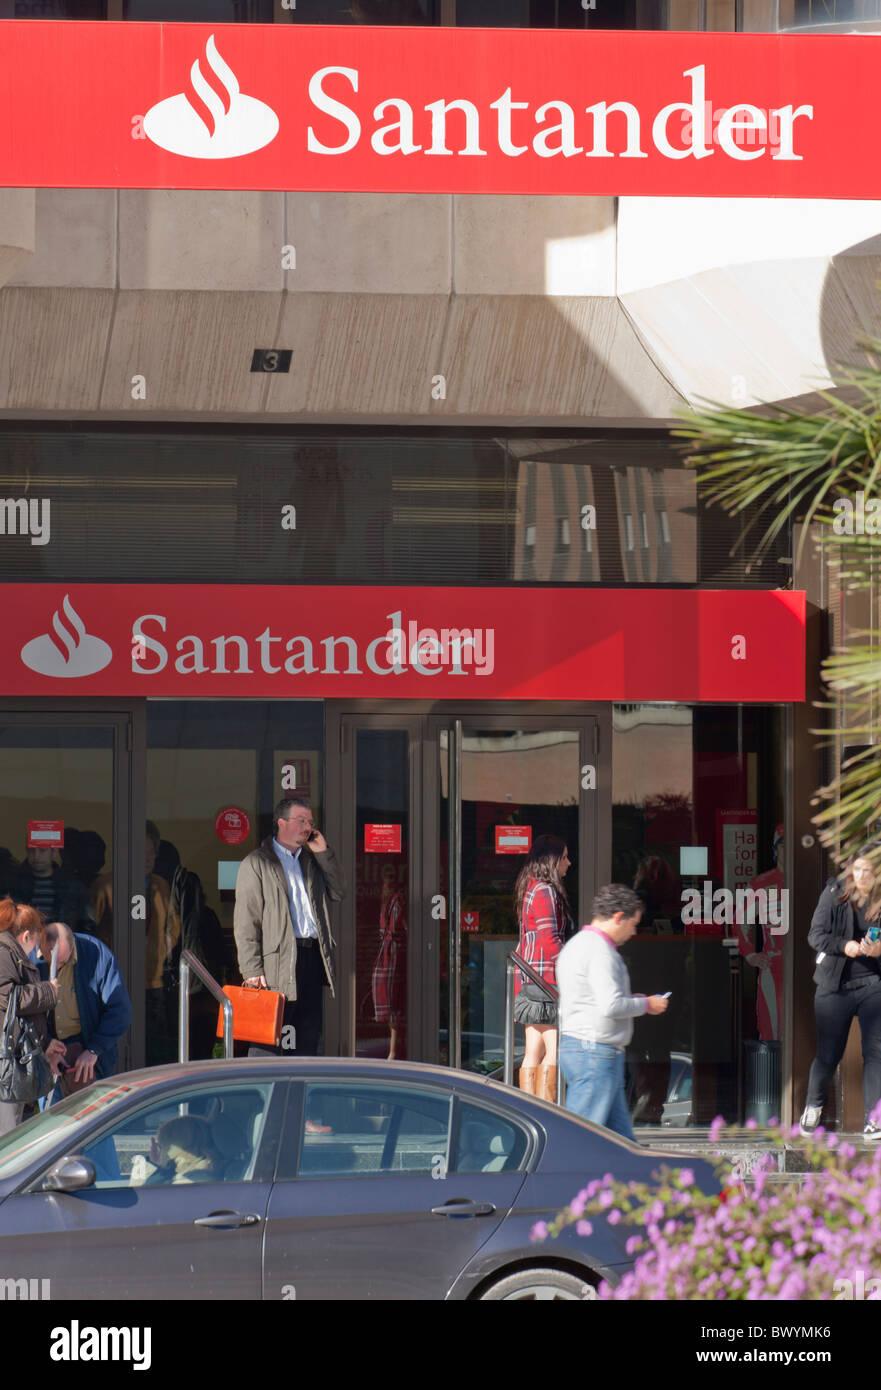 Filiale der Santander Bank in Malaga, Spanien. Stockbild